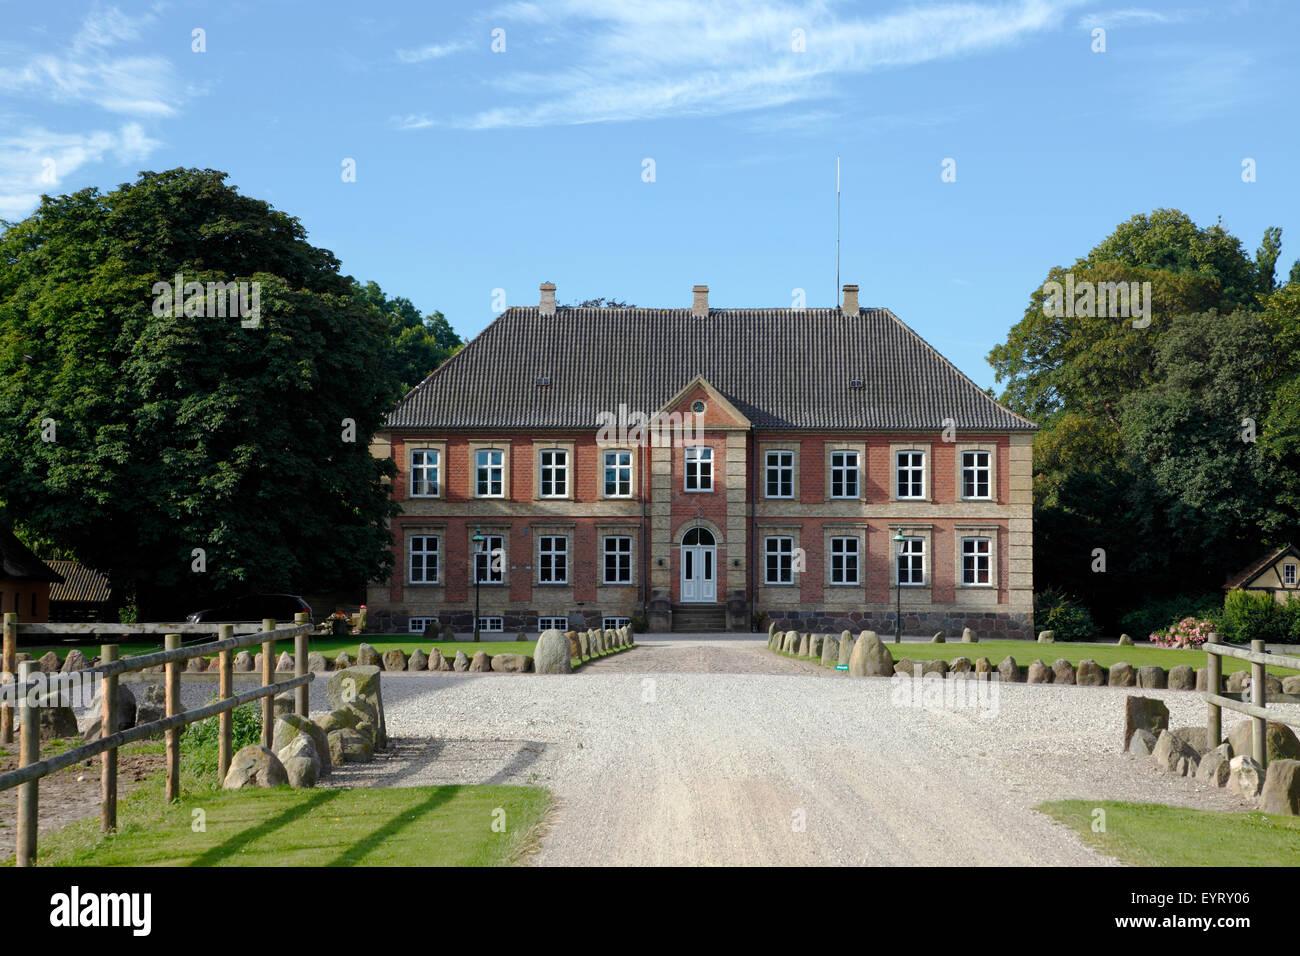 The manor Grønnessegaard at Hundested, Denmark - Stock Image